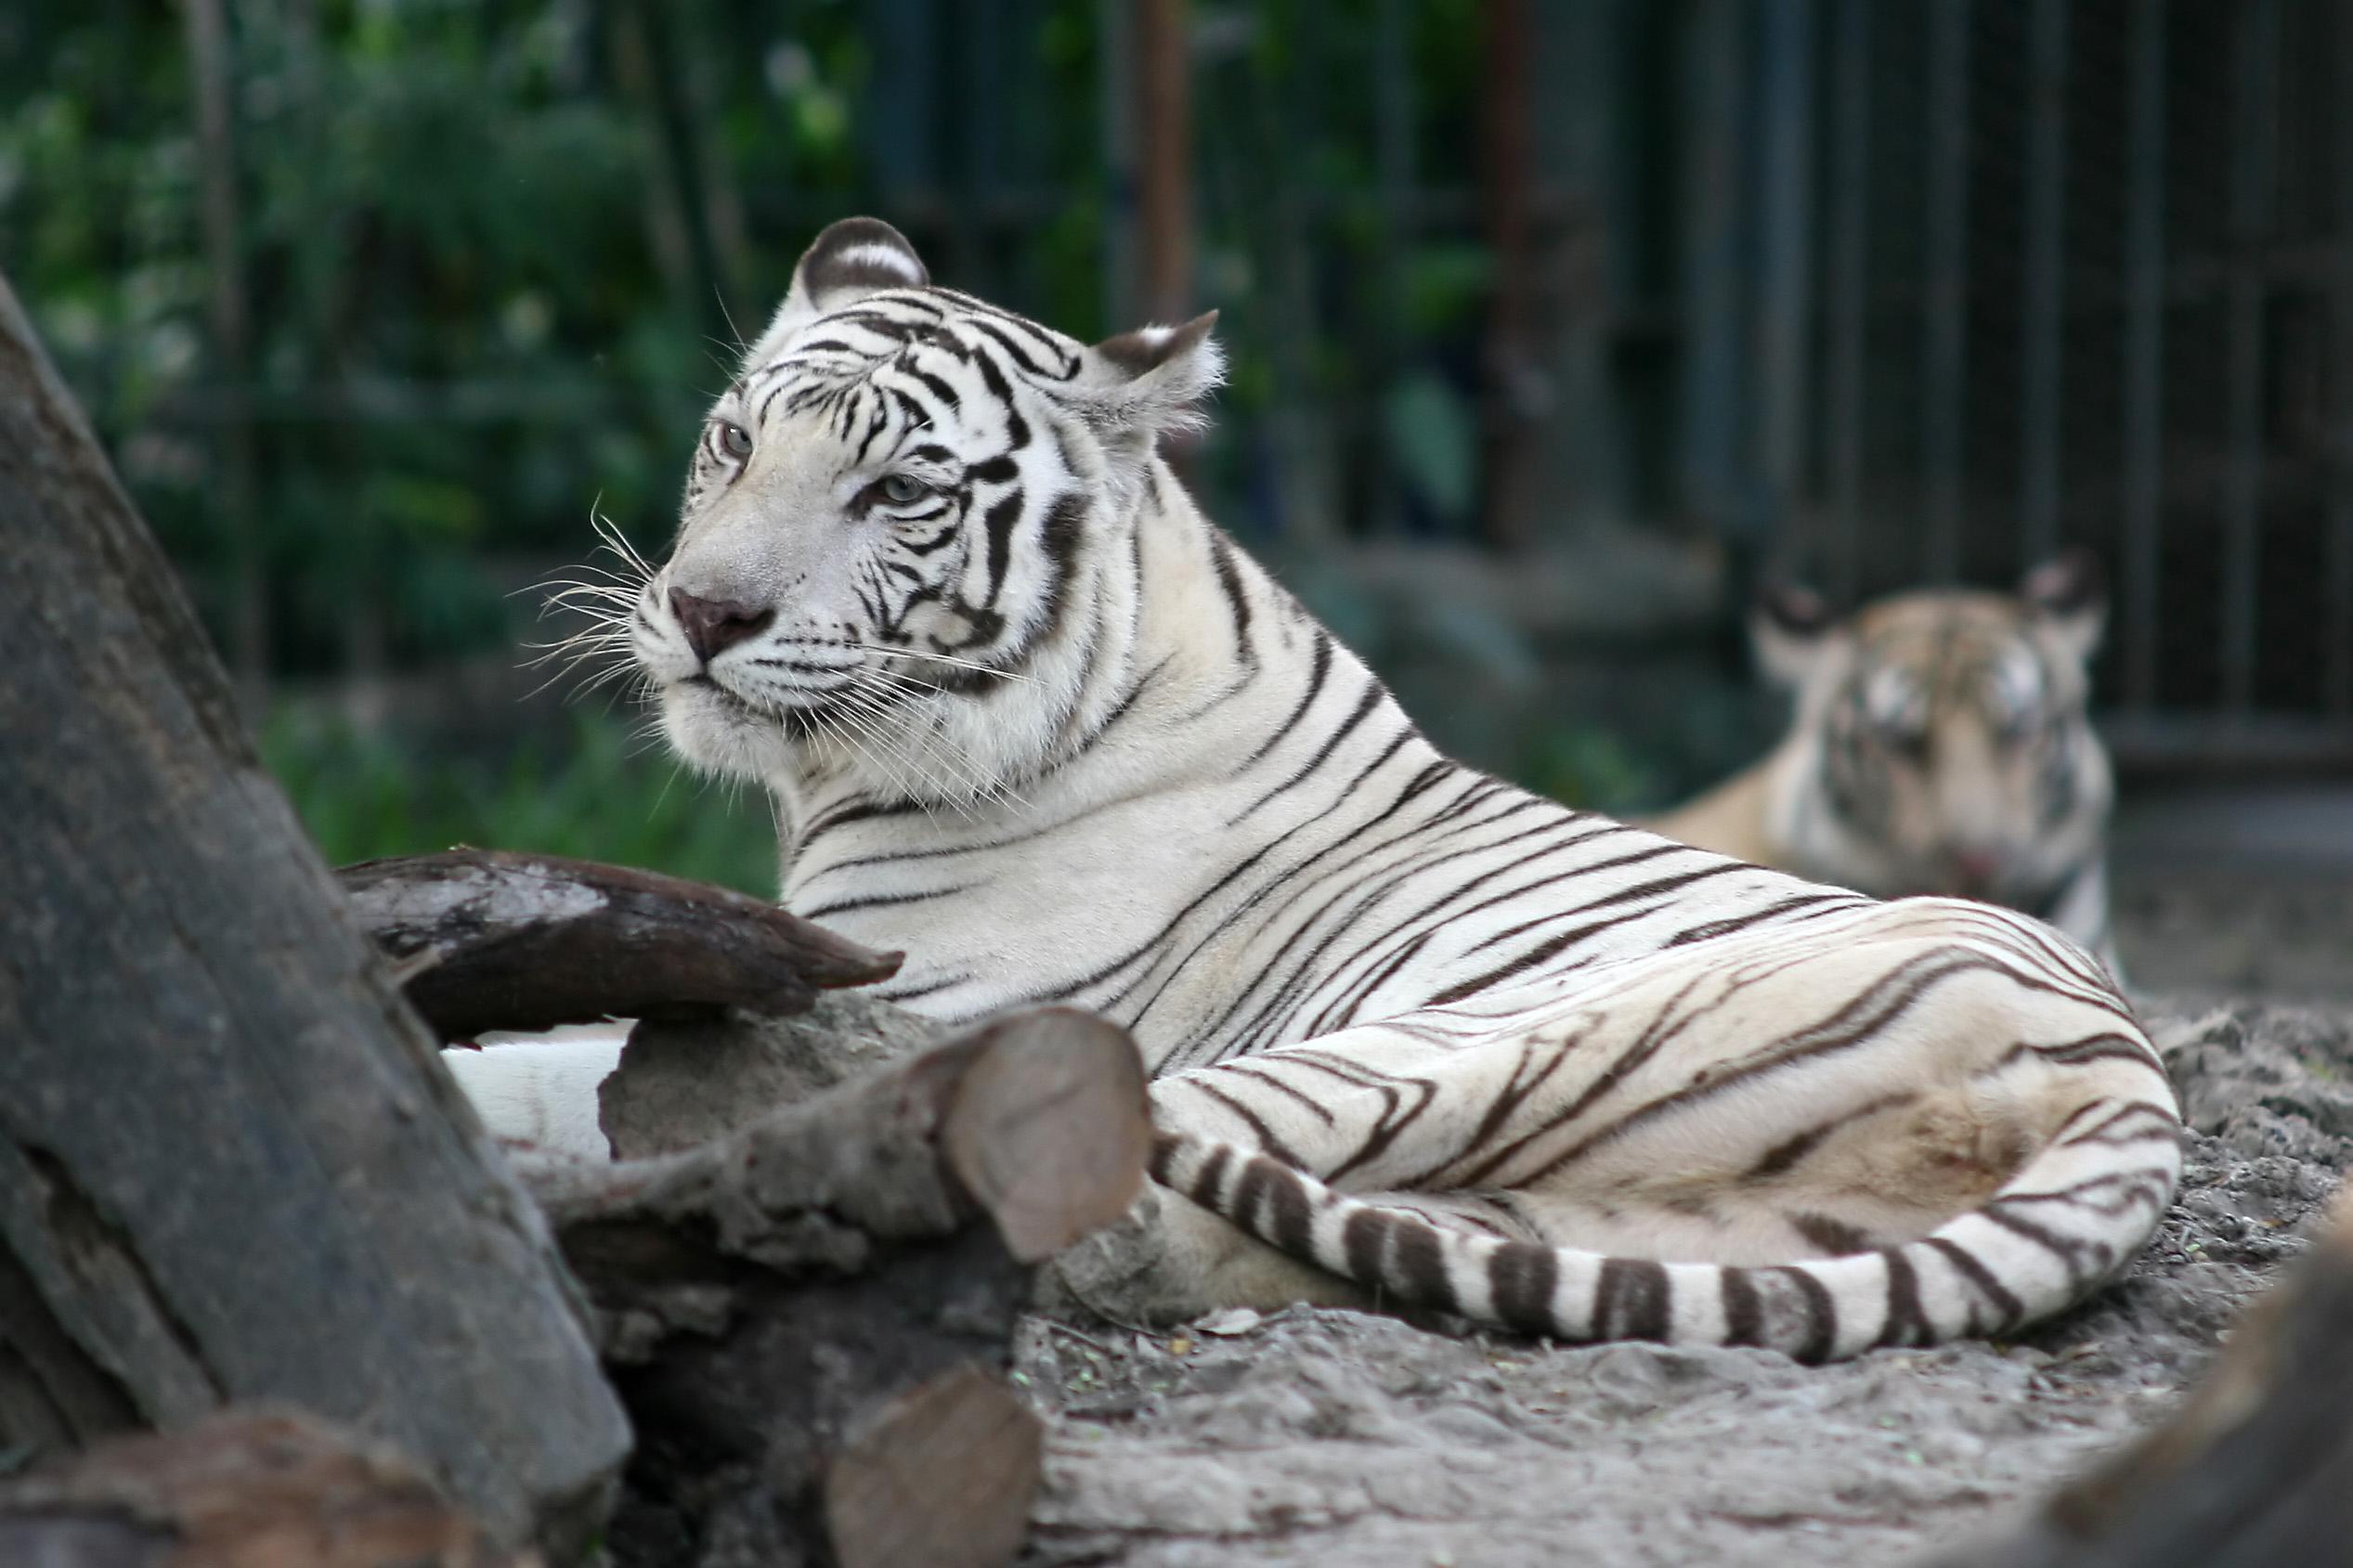 Bengal Tiger, native to Bagladesh